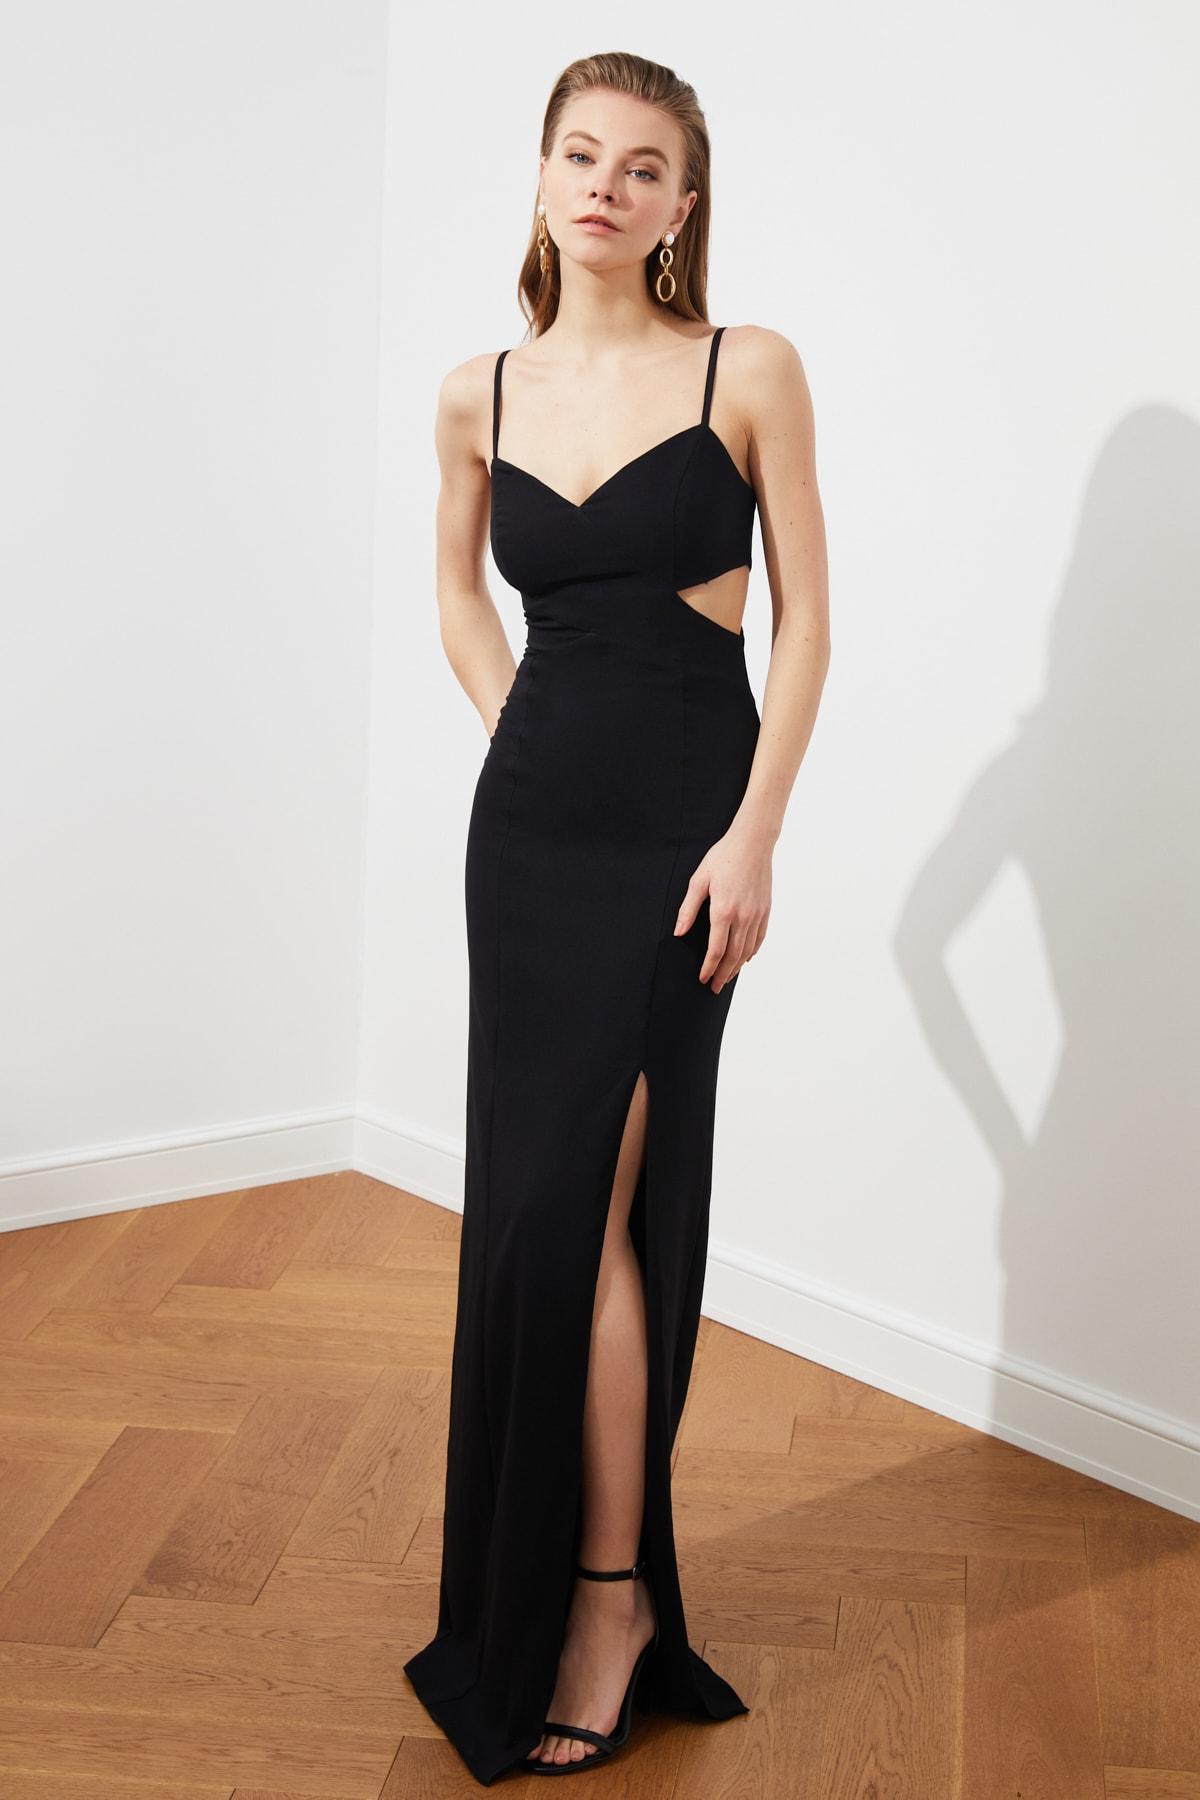 Evening dress Black Low-Cut Detailed Evening Dress фото